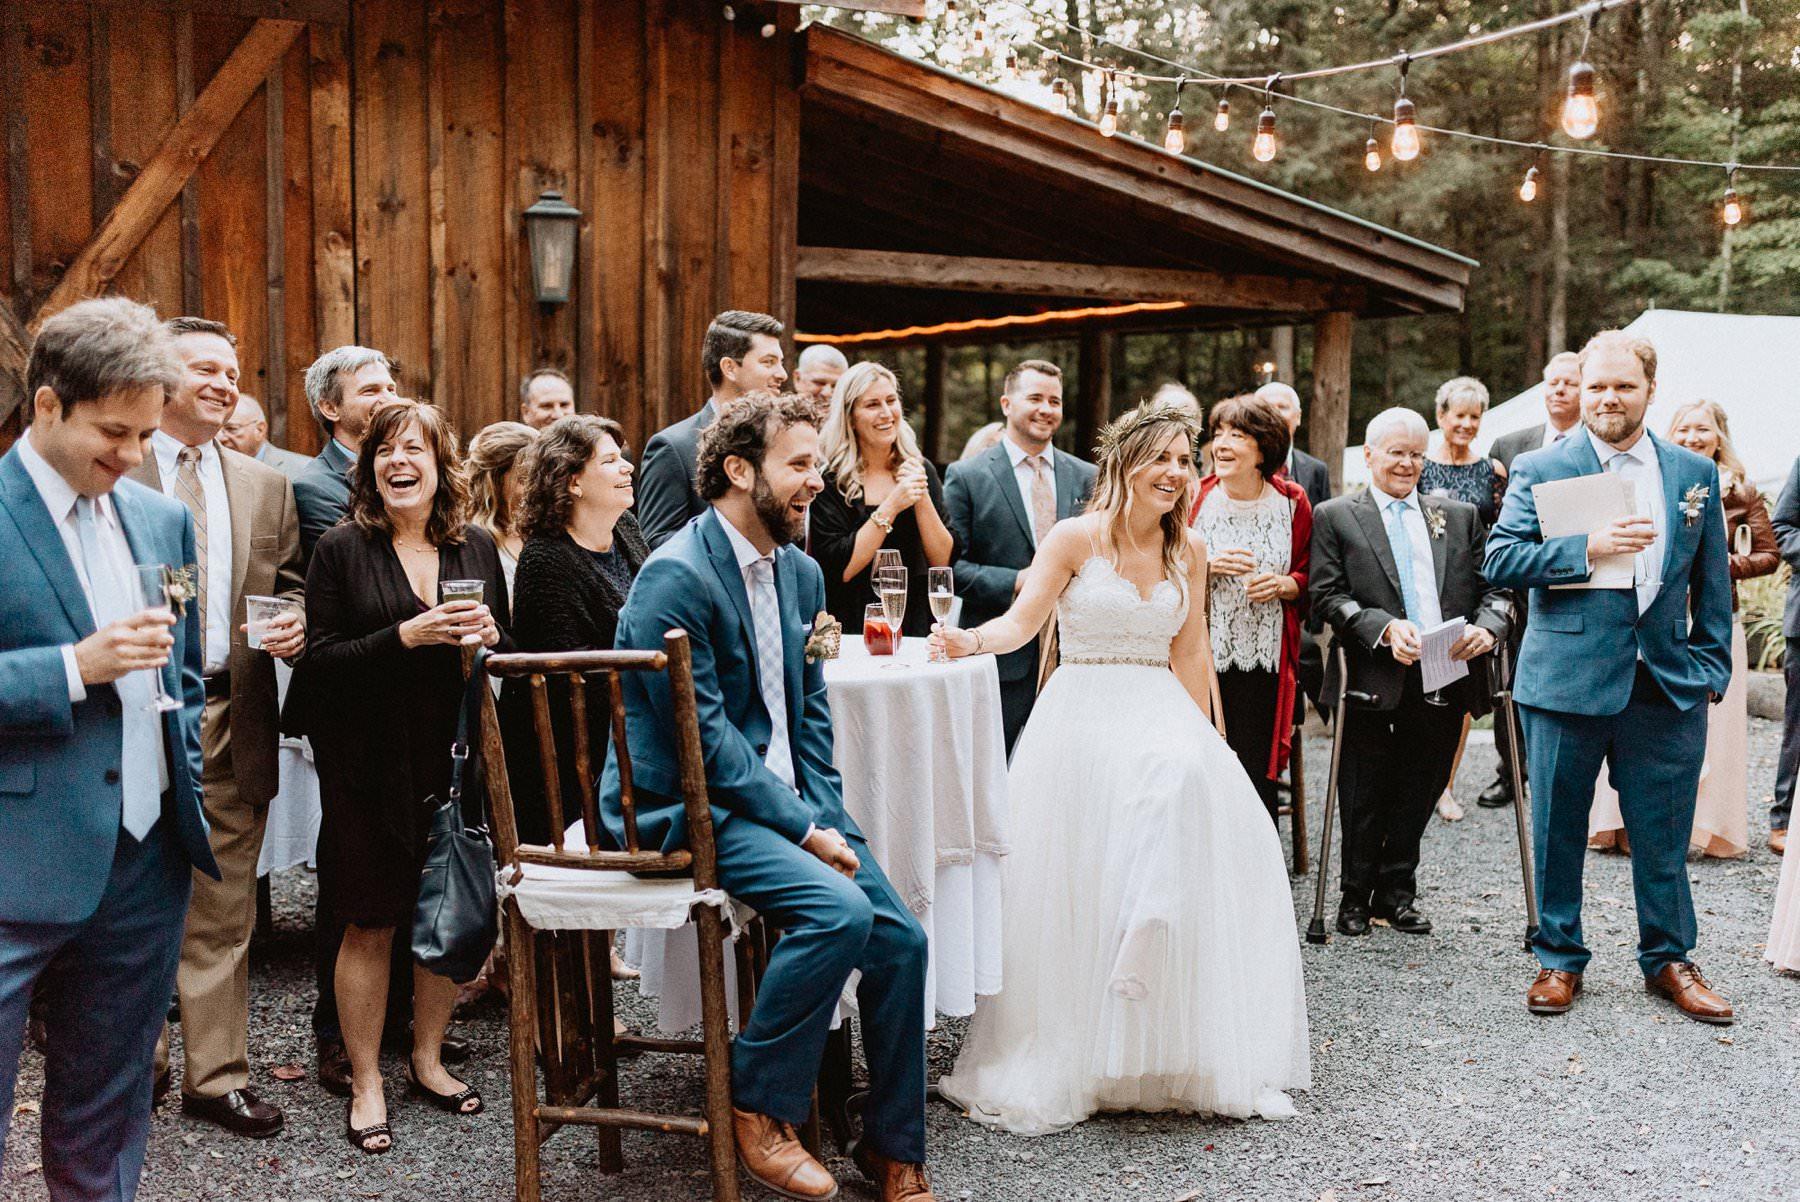 062-Tall-timber-barn-wedding-73.jpg